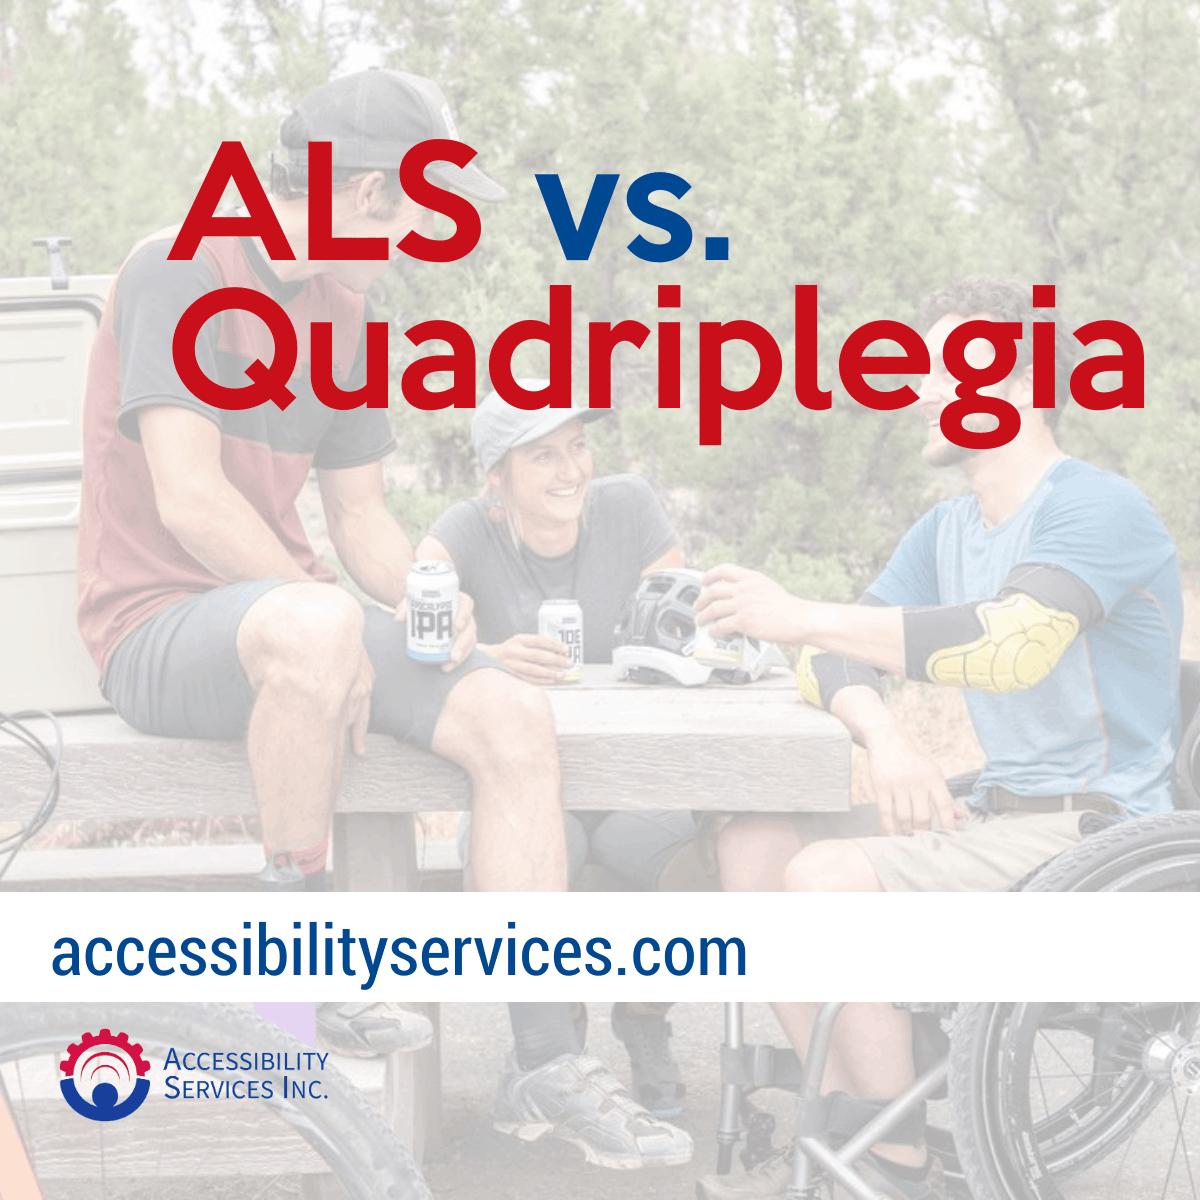 communication devices for quadriplegics